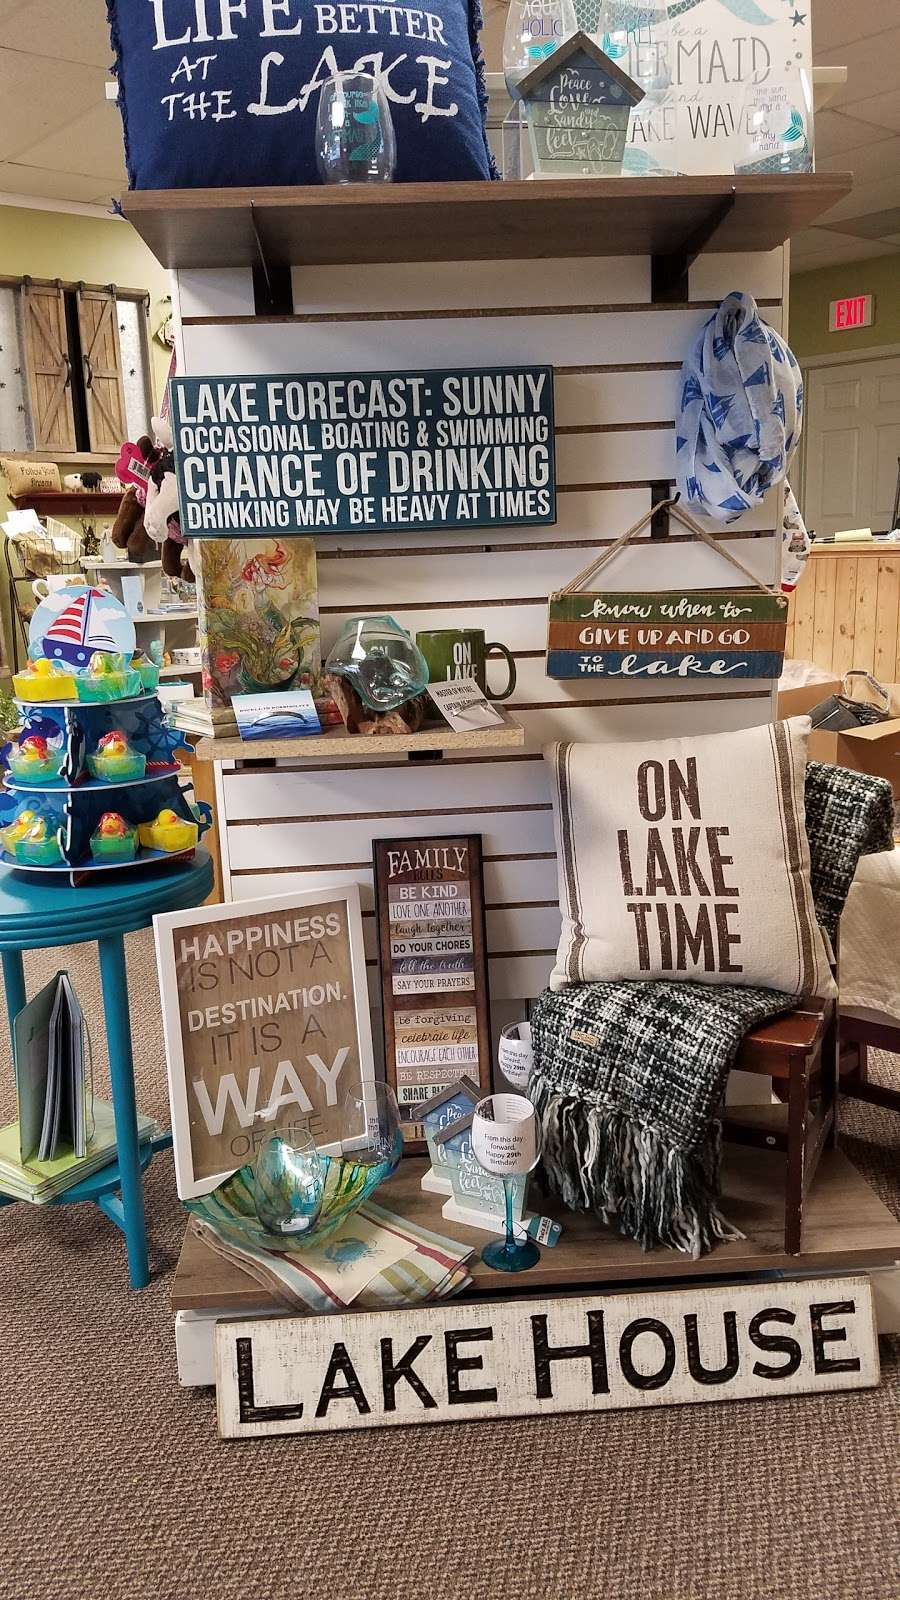 Krickettes Gift Shop - store    Photo 8 of 8   Address: 640 E Ryan Rd, Oak Creek, WI 53154, USA   Phone: (414) 775-2017